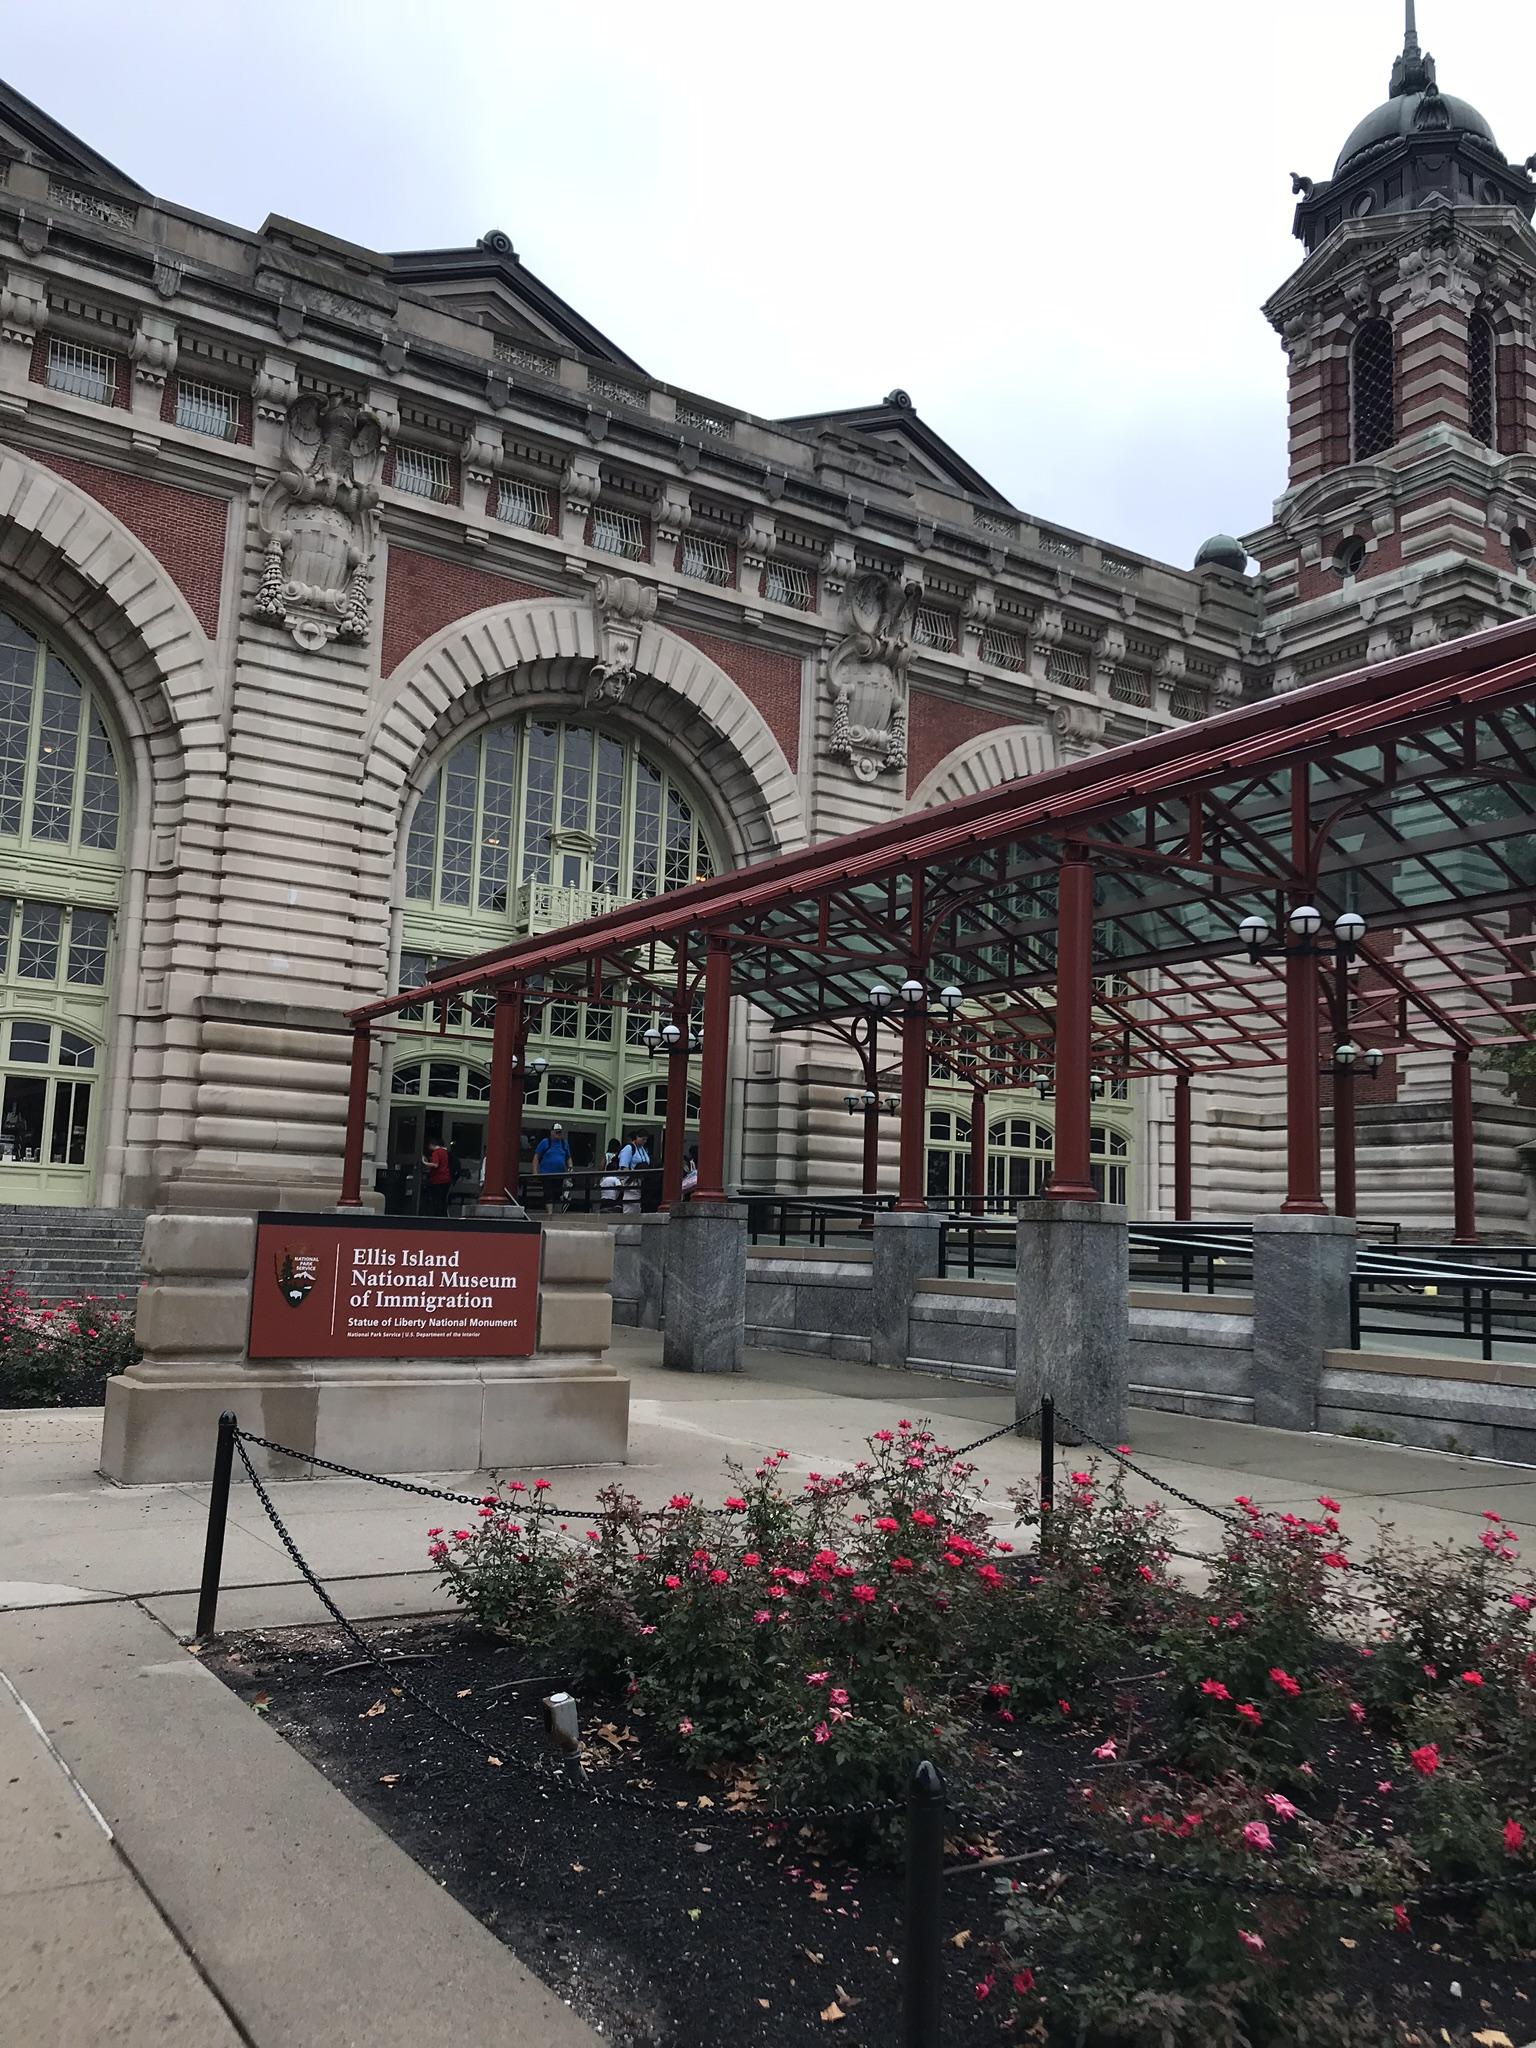 The renovated museum of Ellis Island.